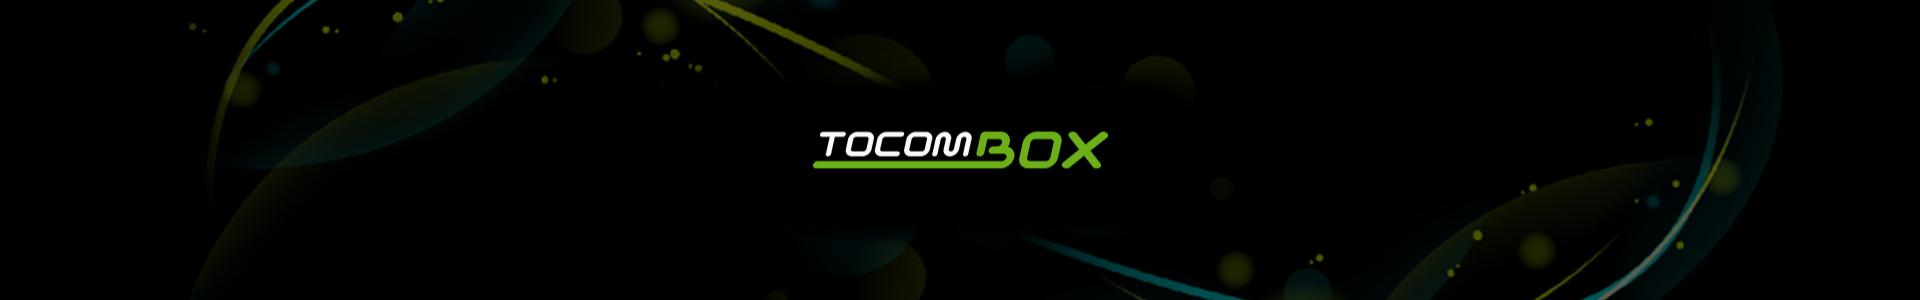 tocombox-share.jpg